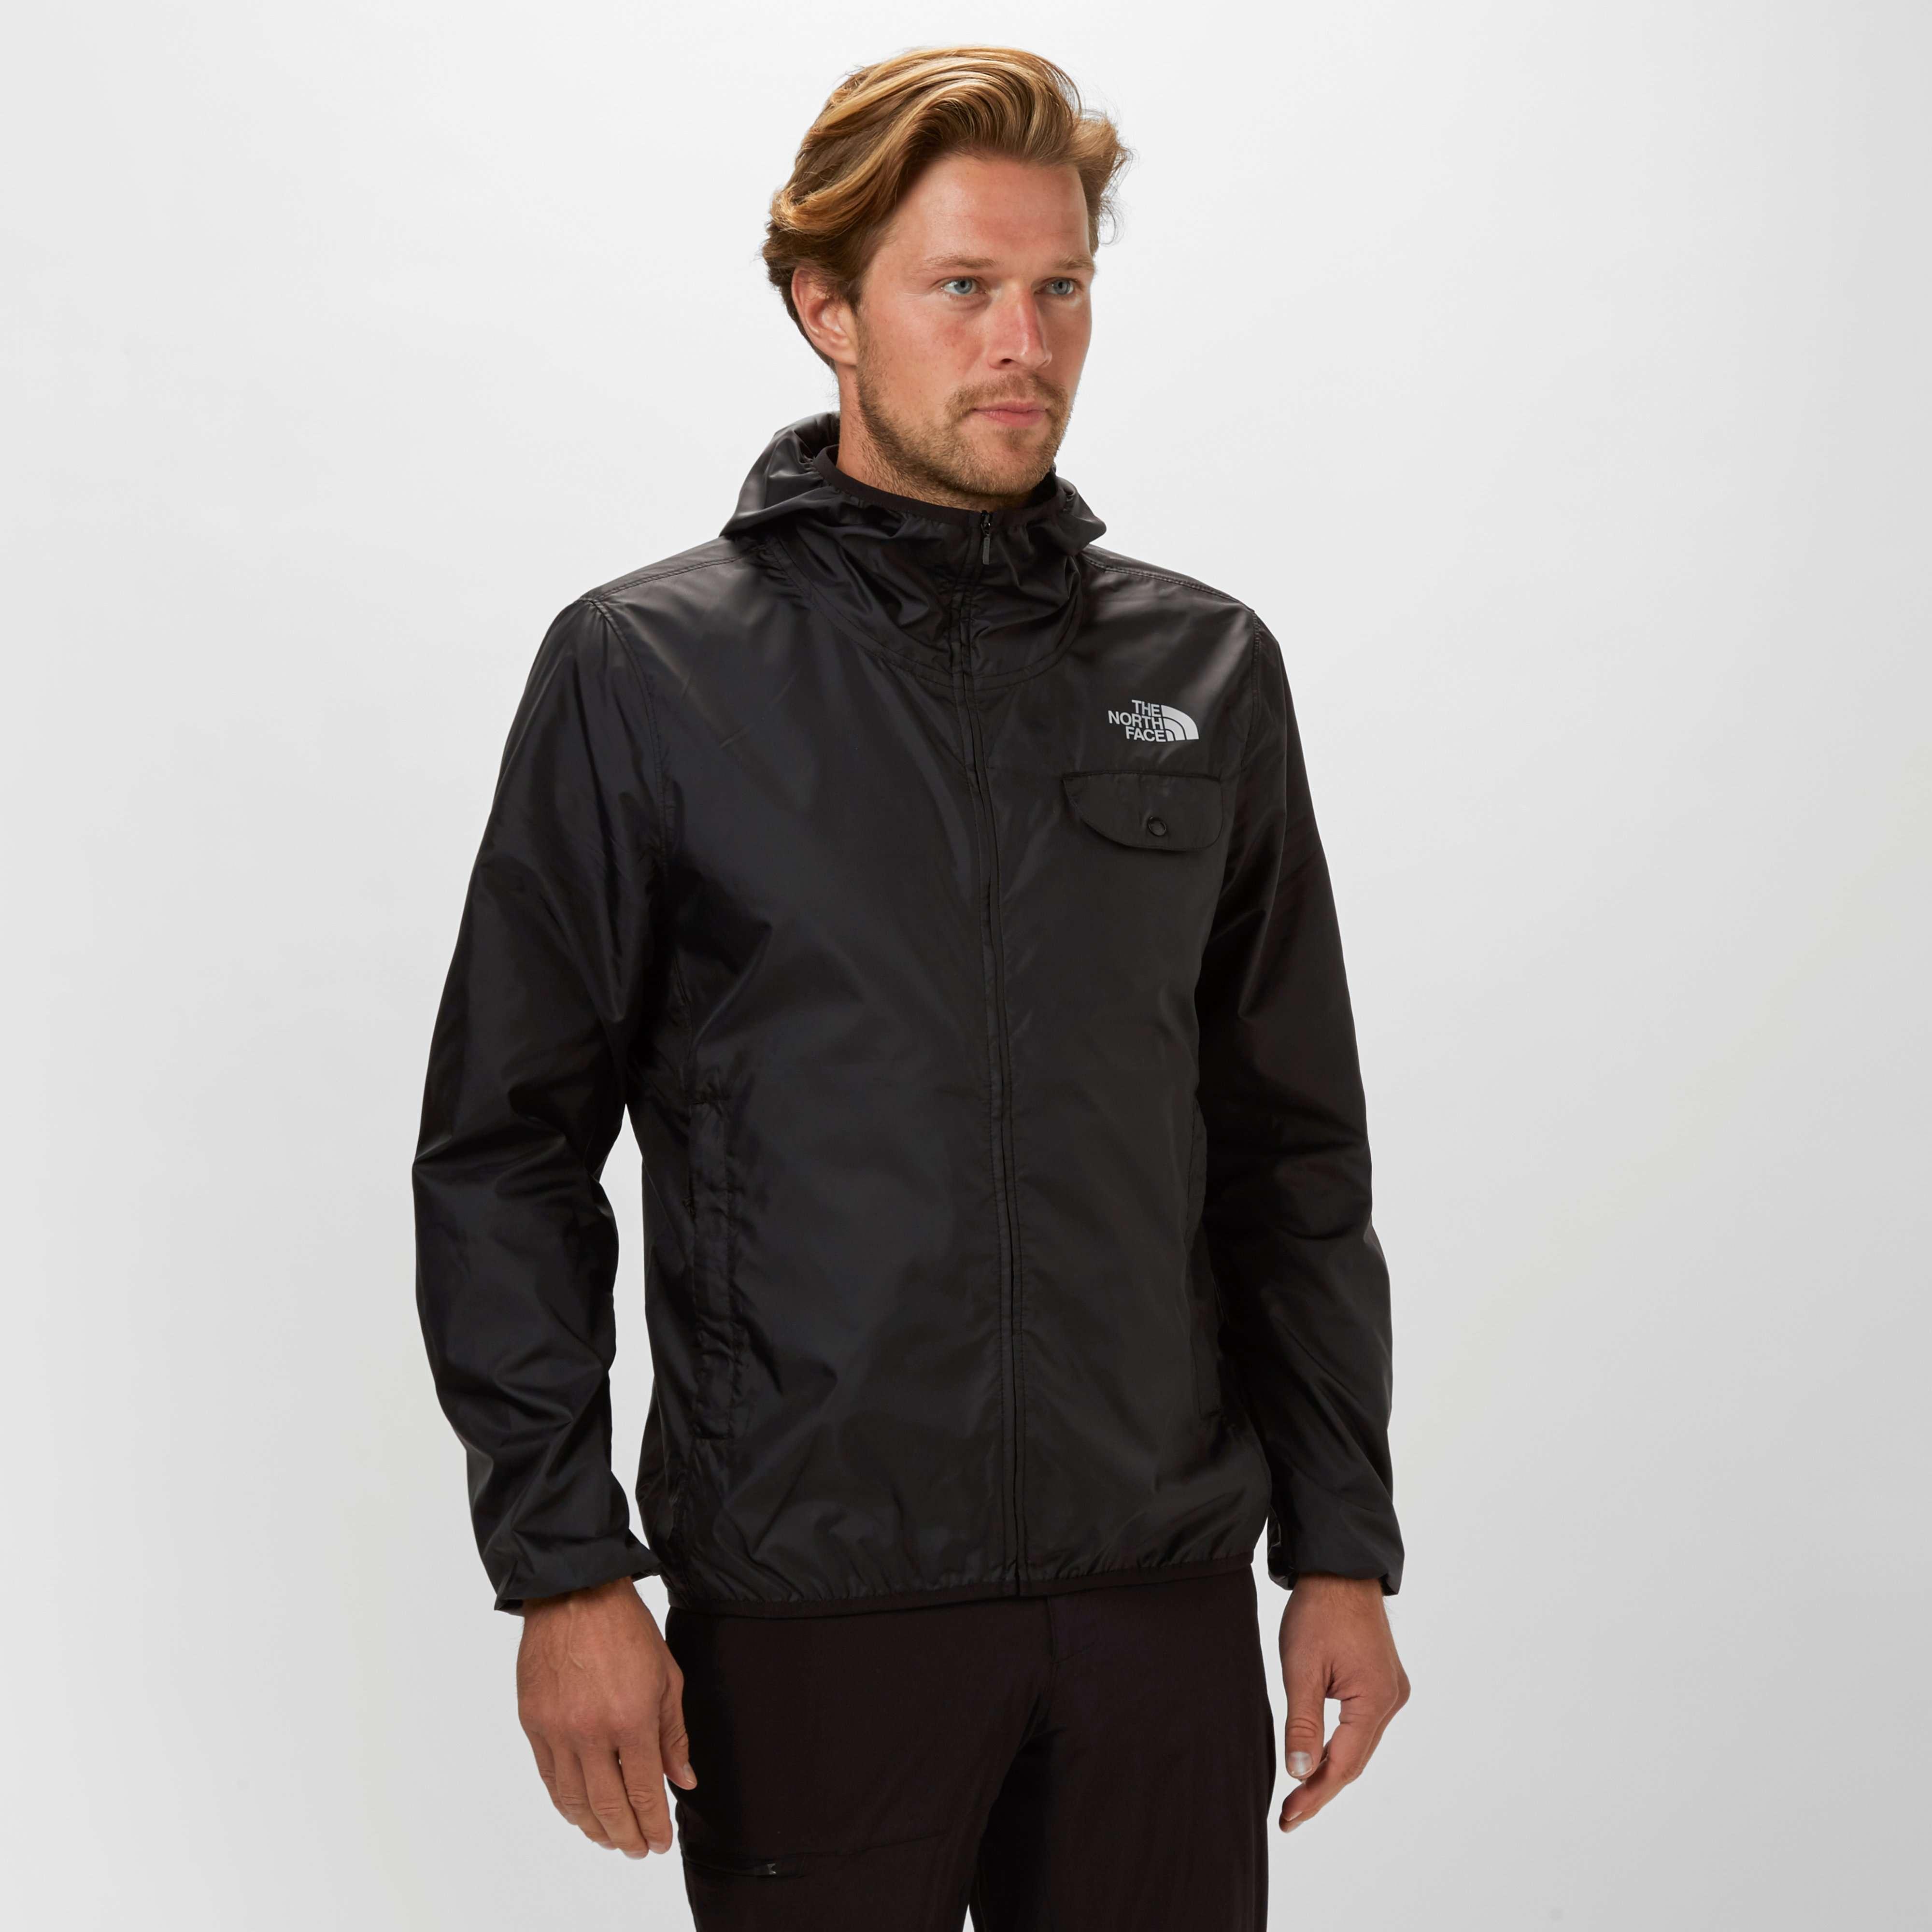 THE NORTH FACE Men's Tanken WindWall™ Jacket